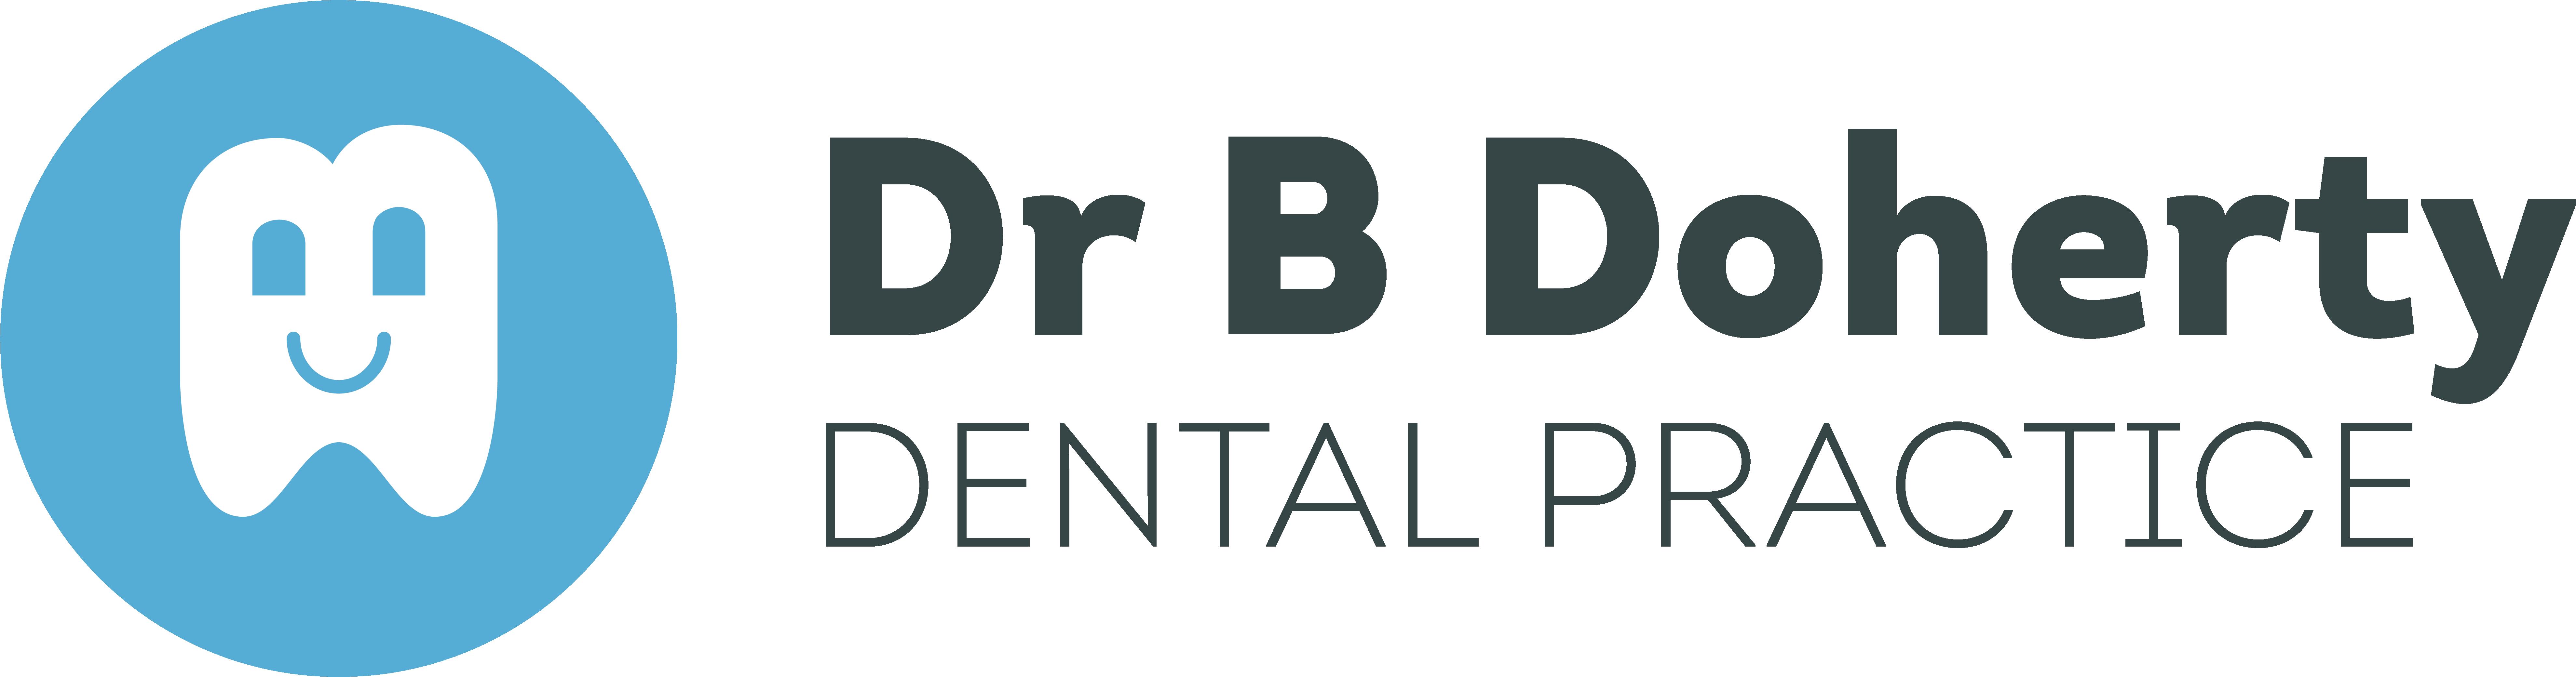 Dr B Doherty